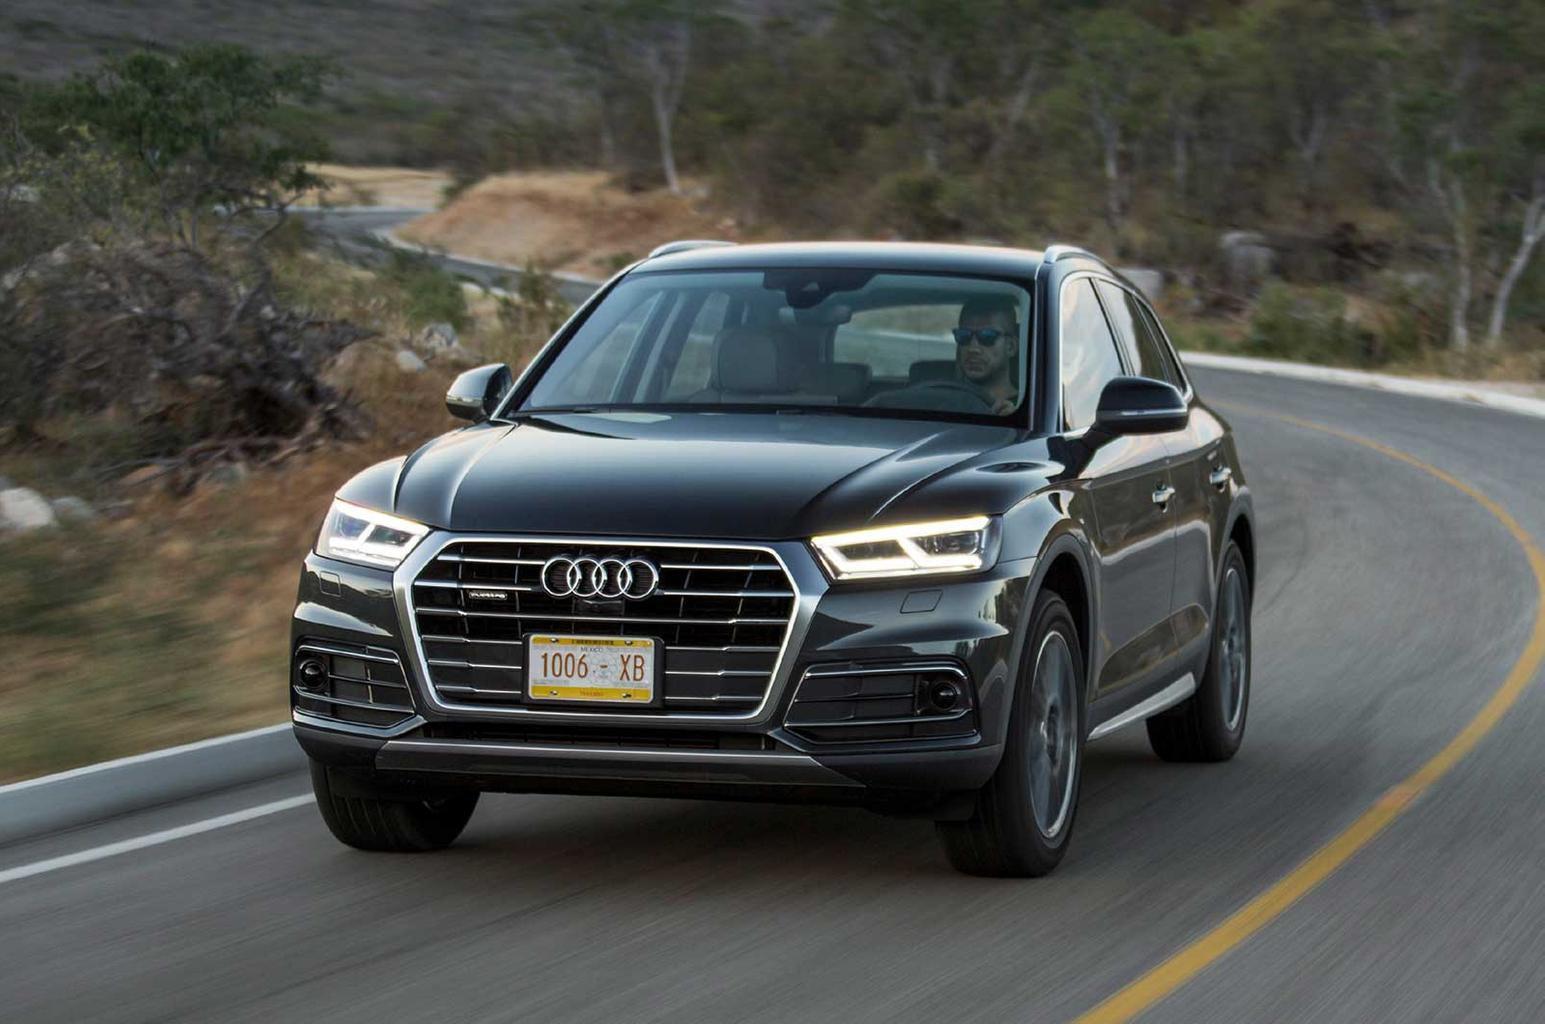 Best and worst large SUVs 2018